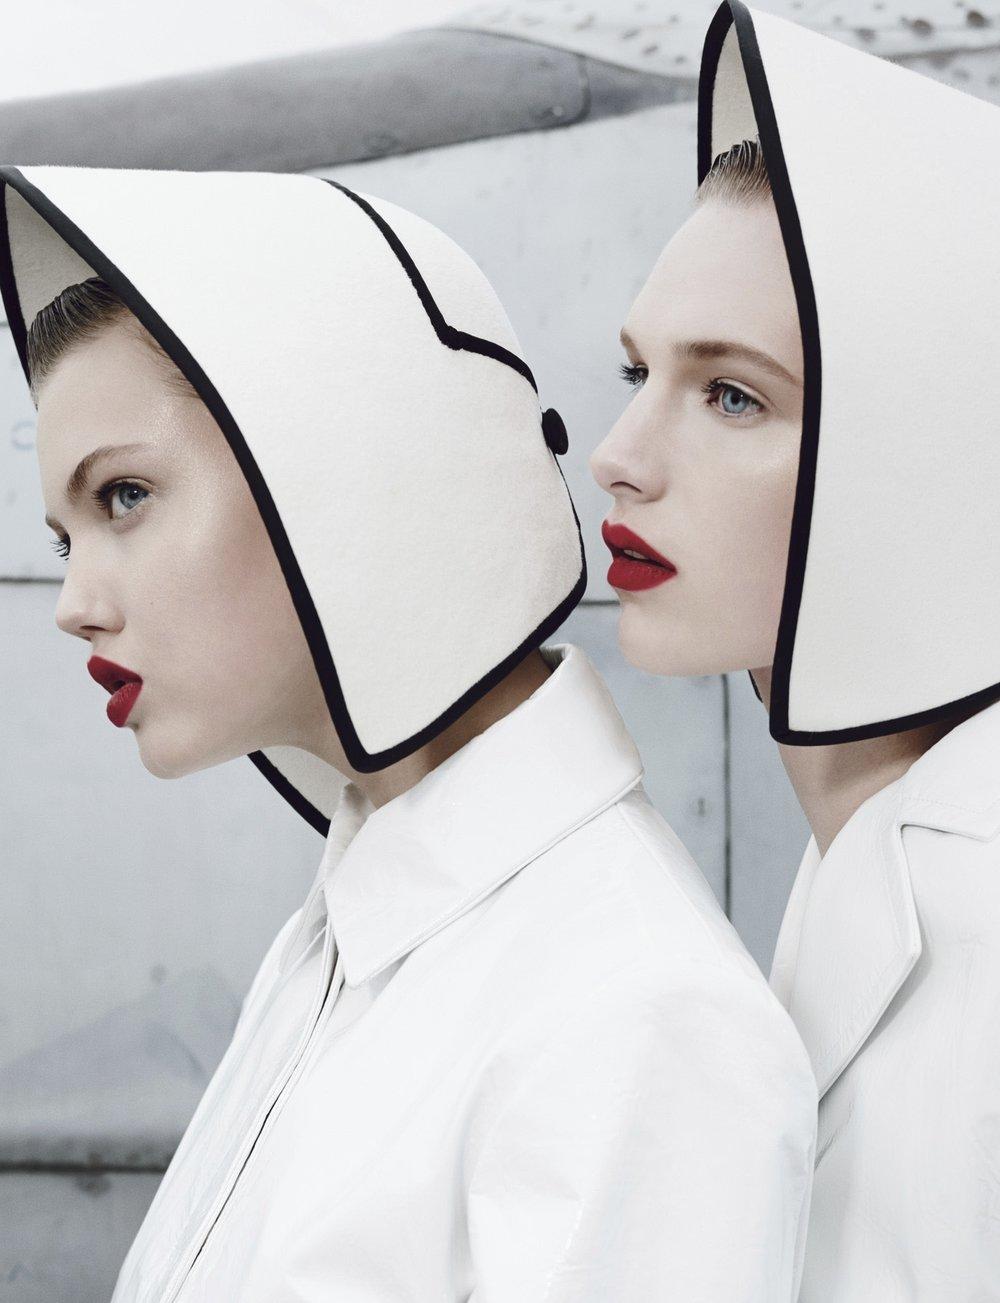 Giovanna-Battaglia-5-Super-Fly-W-Magazine-Emma-Summerton.jpg